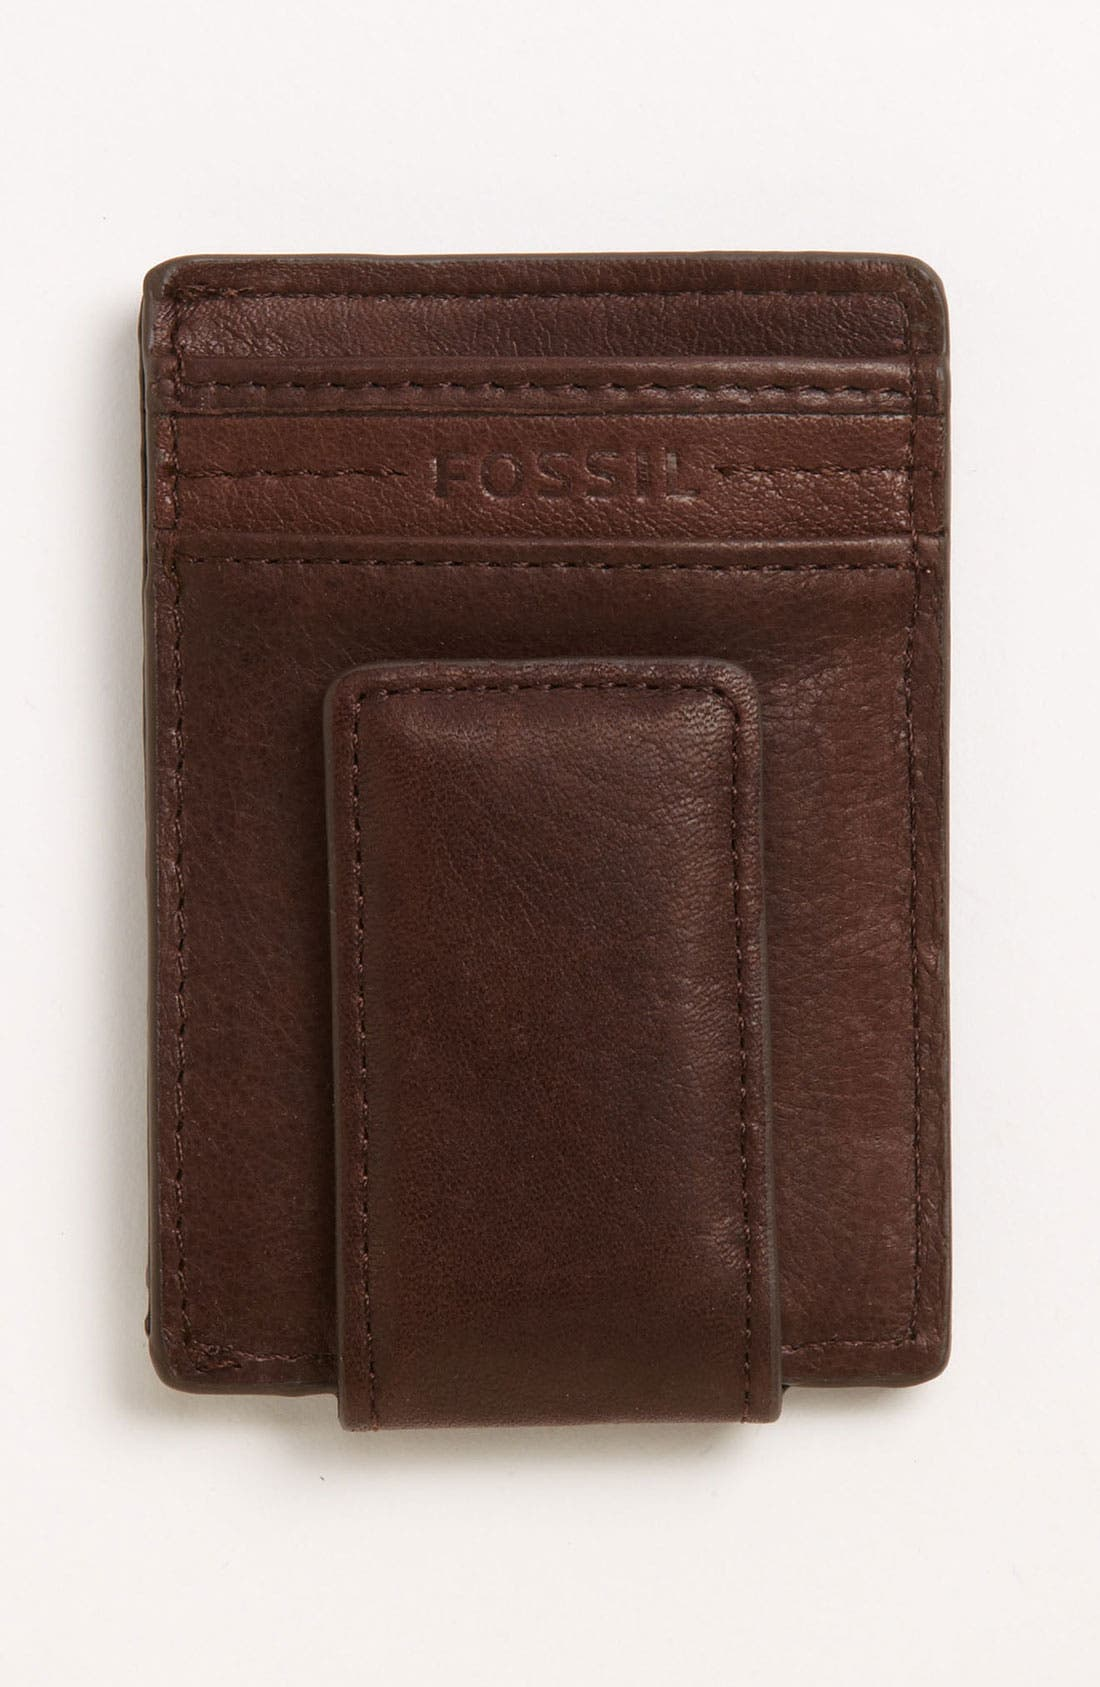 Main Image - Fossil 'Mag' Card Holder